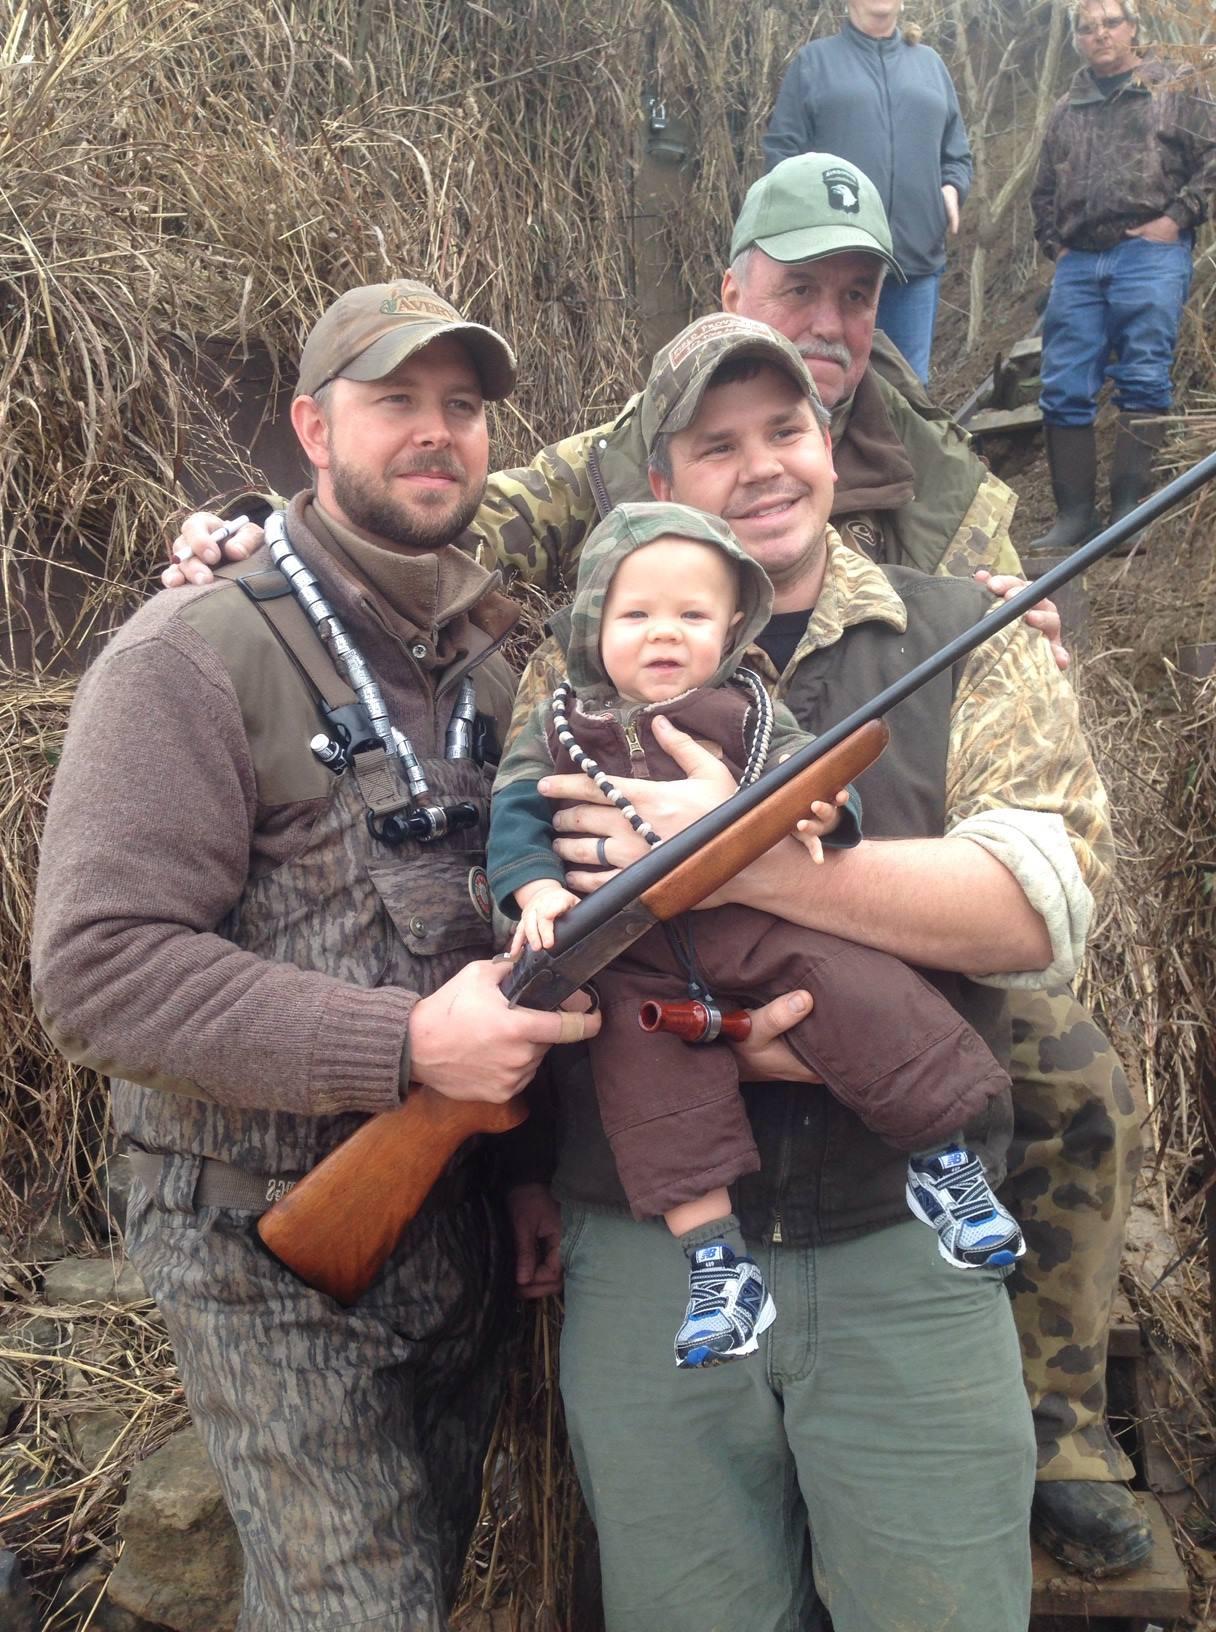 1st birthday, 1st trip to the blind, 1st shot gun, 1st duck call